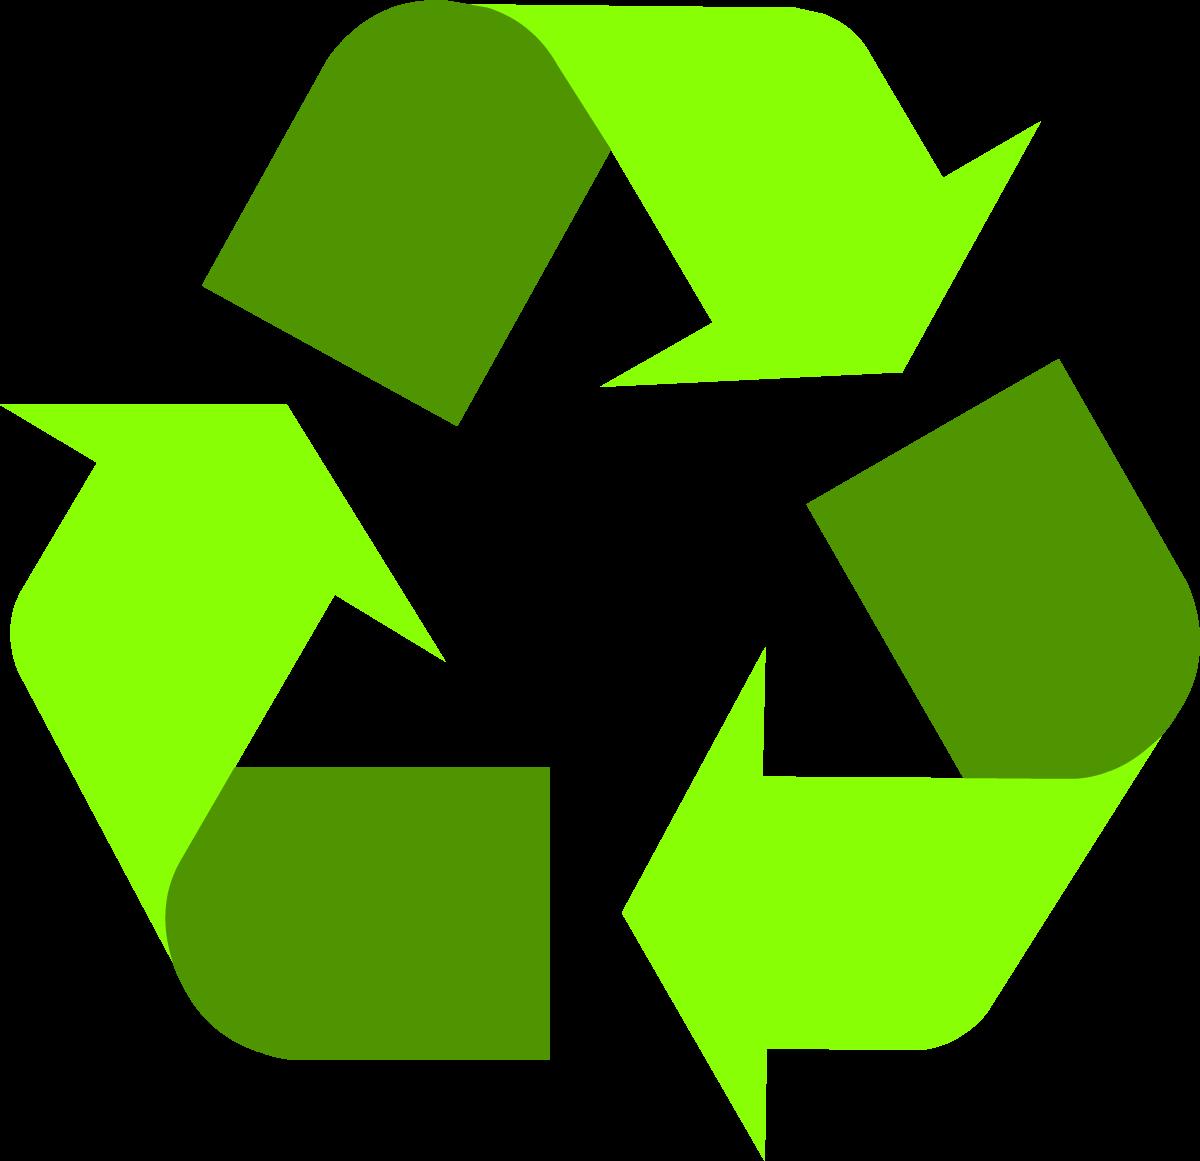 Recycling Symbol.